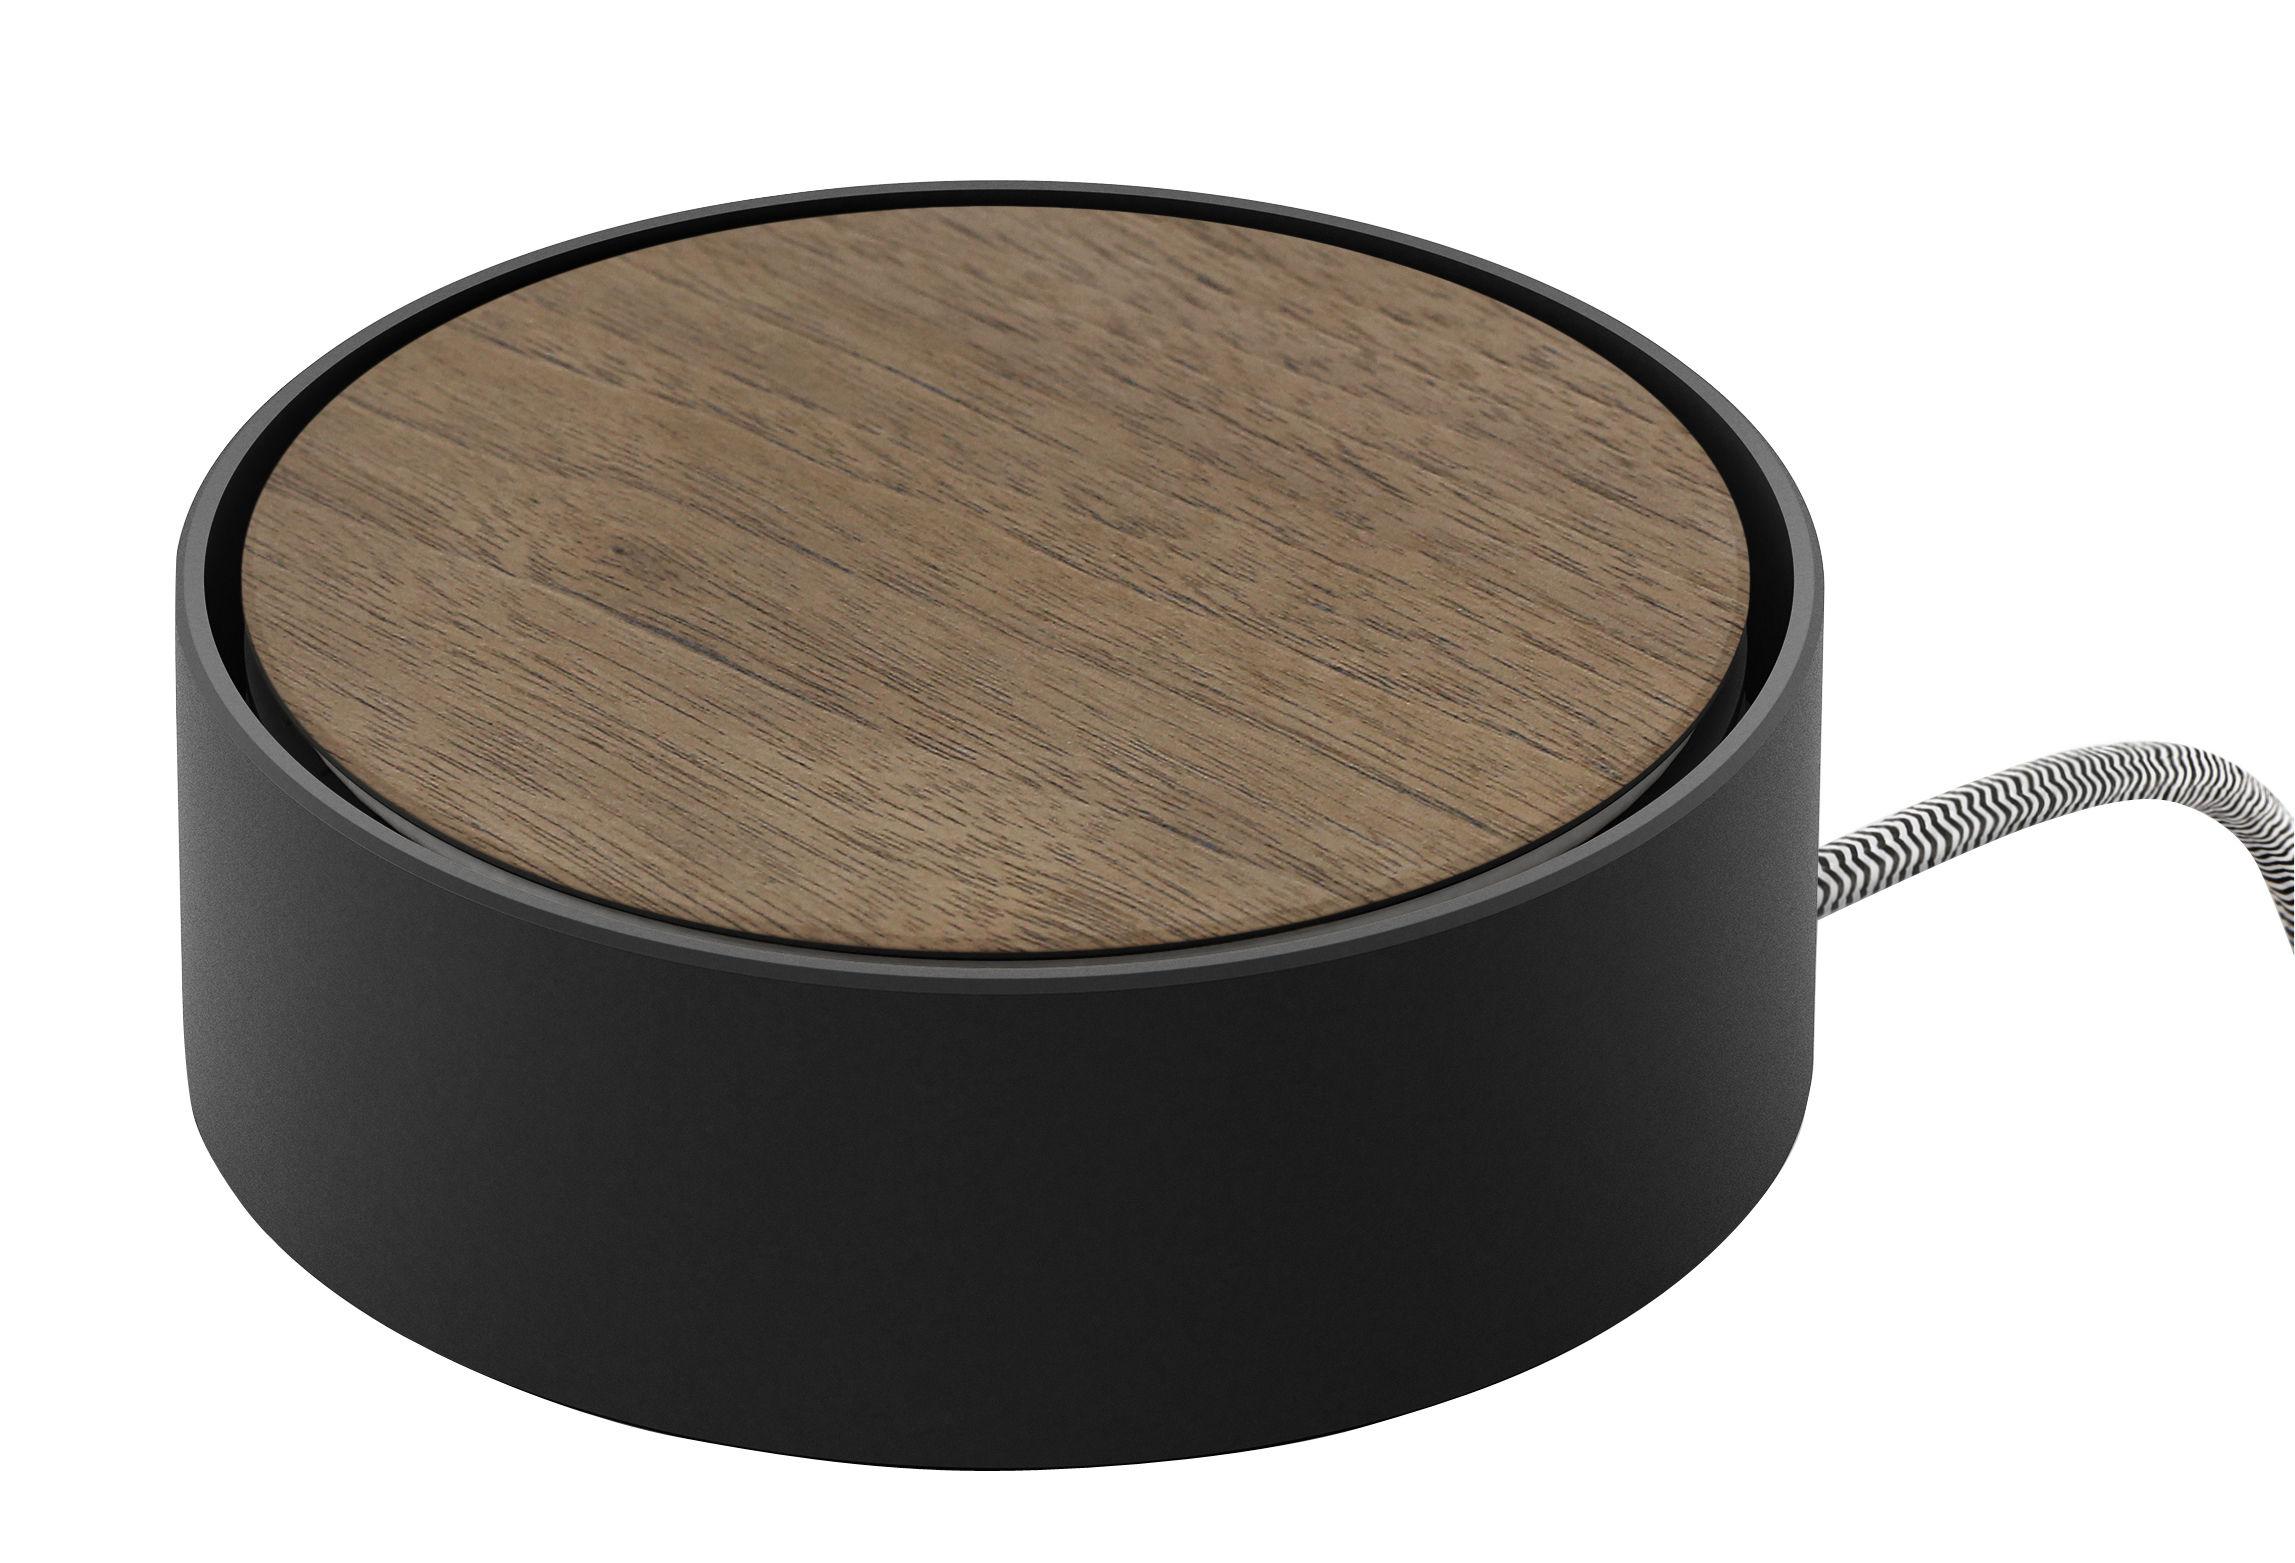 Accessoires - Technik - Eclipse Ladestation / mit 3 USB-Ports - Native Union - Schwarz & holzfarben - Holz, Metall